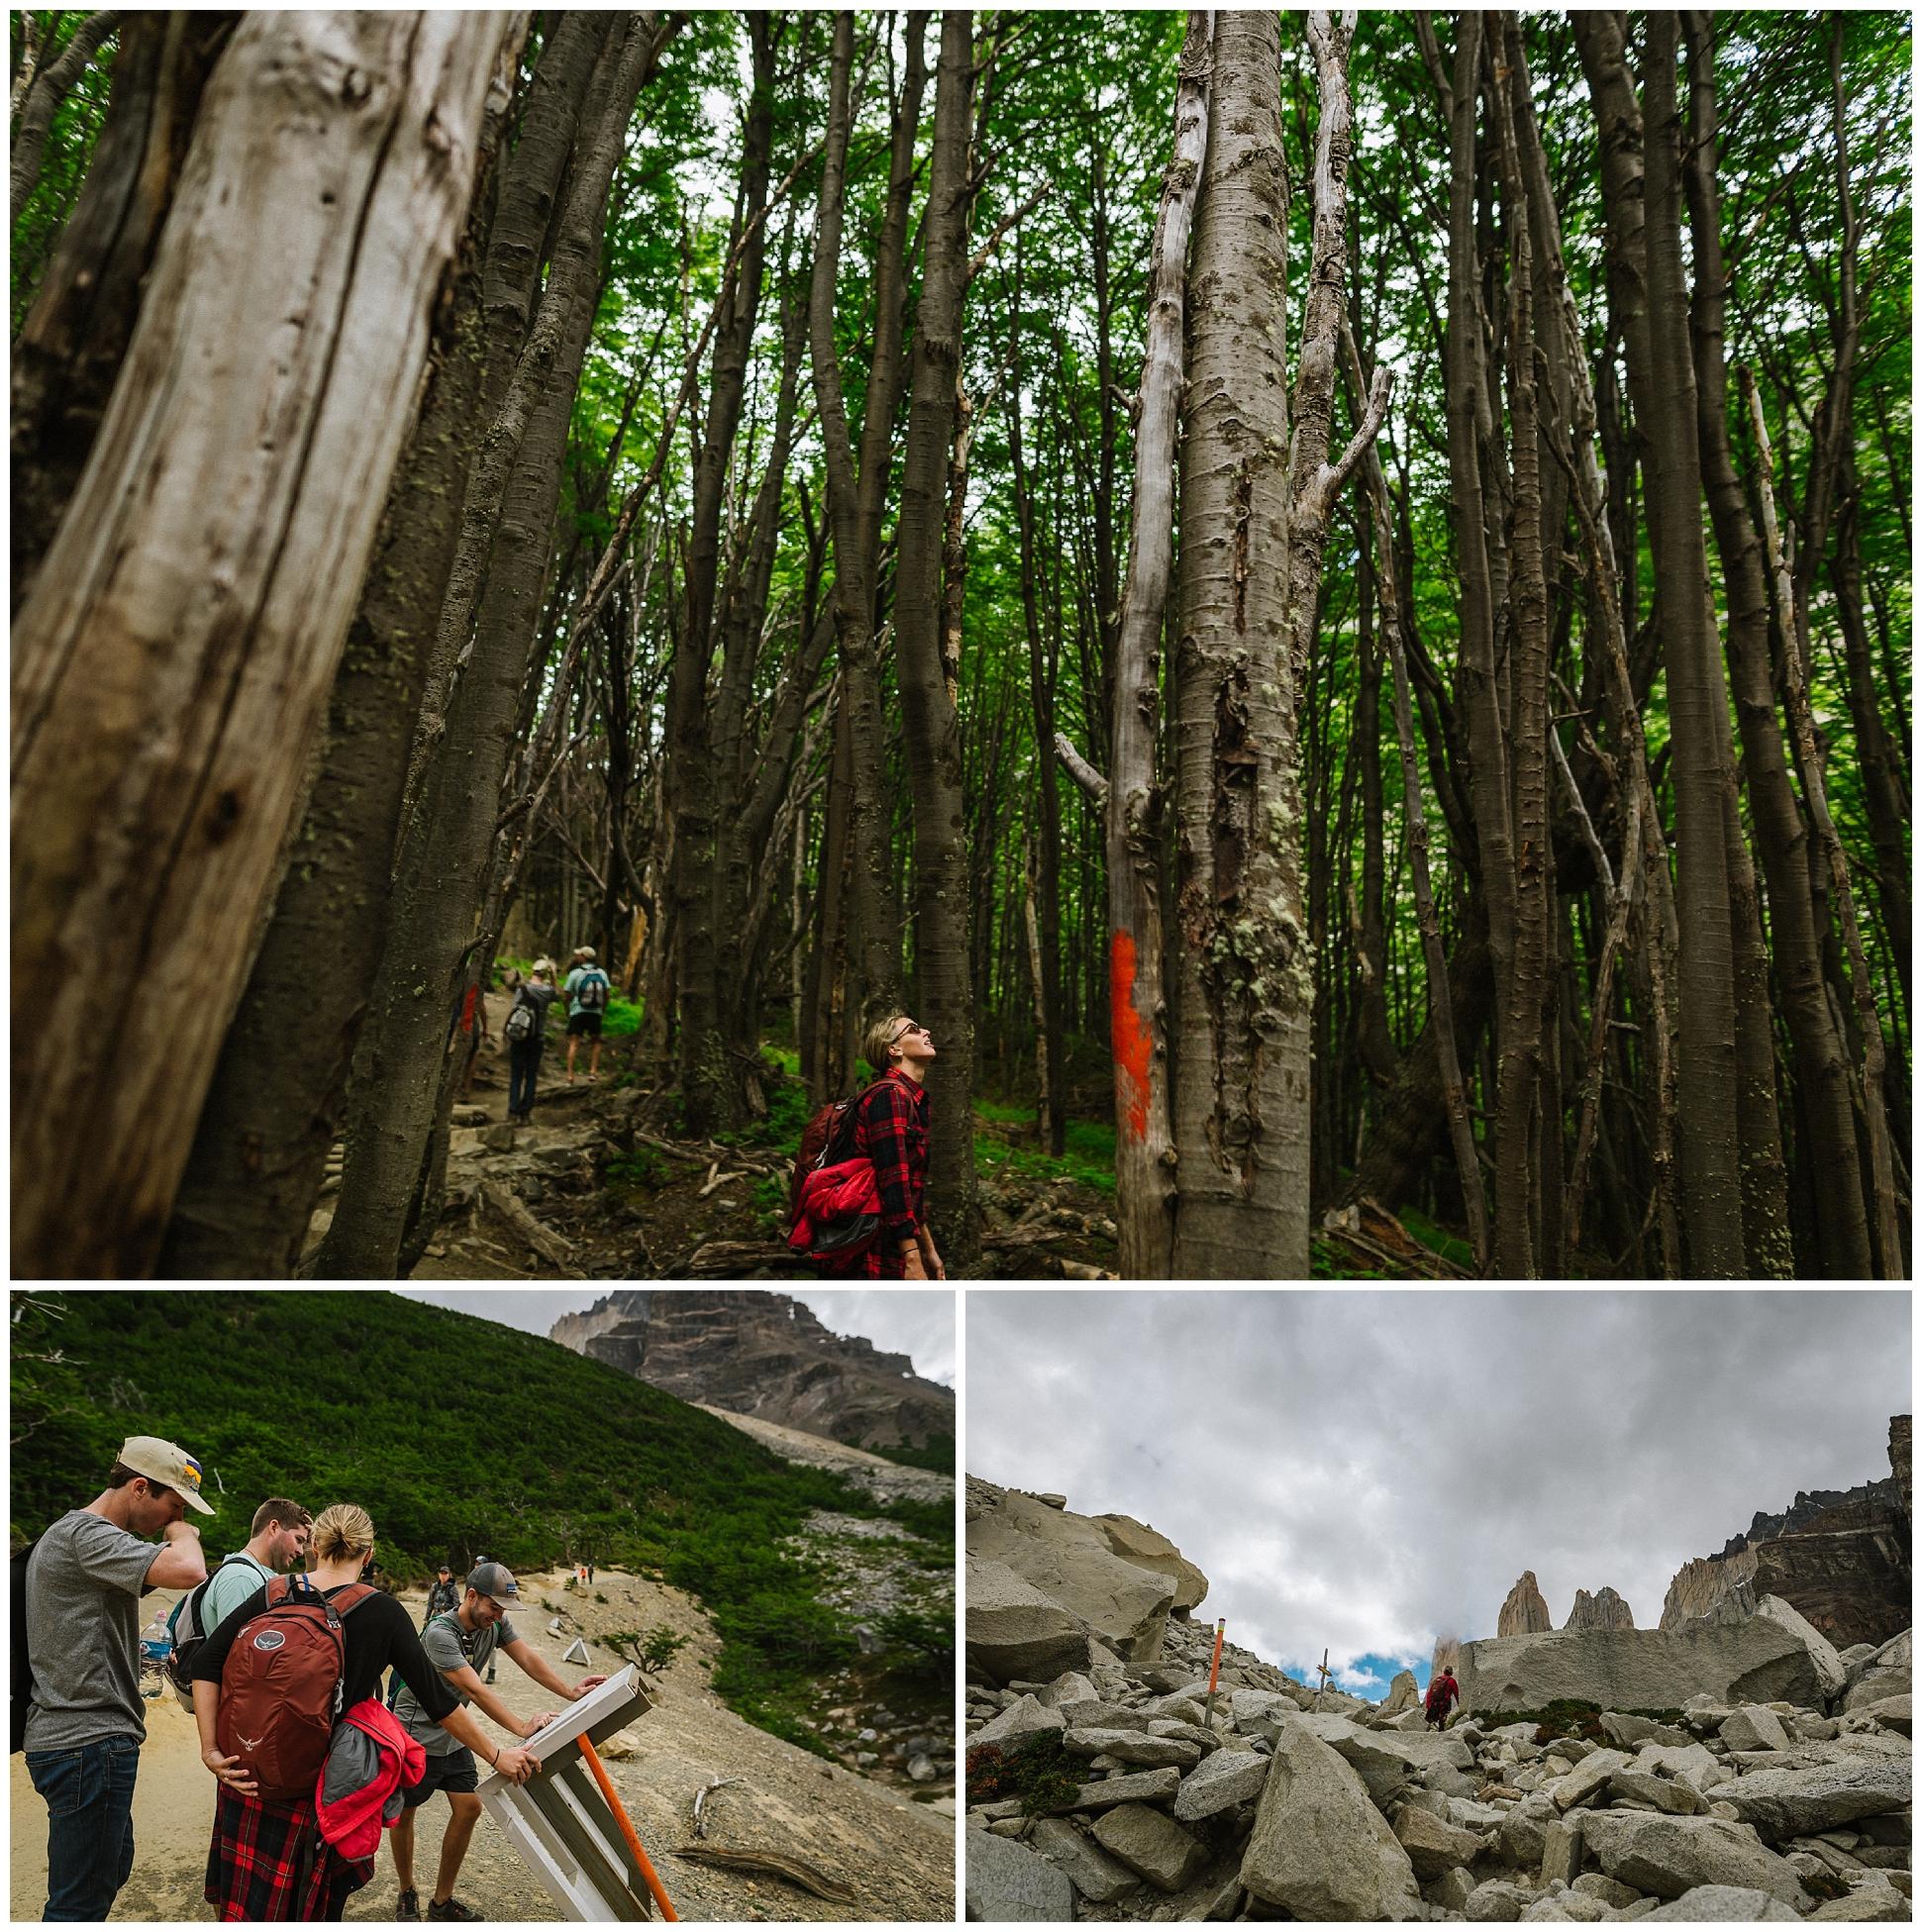 Cheilean-destination-adventure-wedding-florida-patagonia-pucon-santa-cruz-vsco_0006.jpg